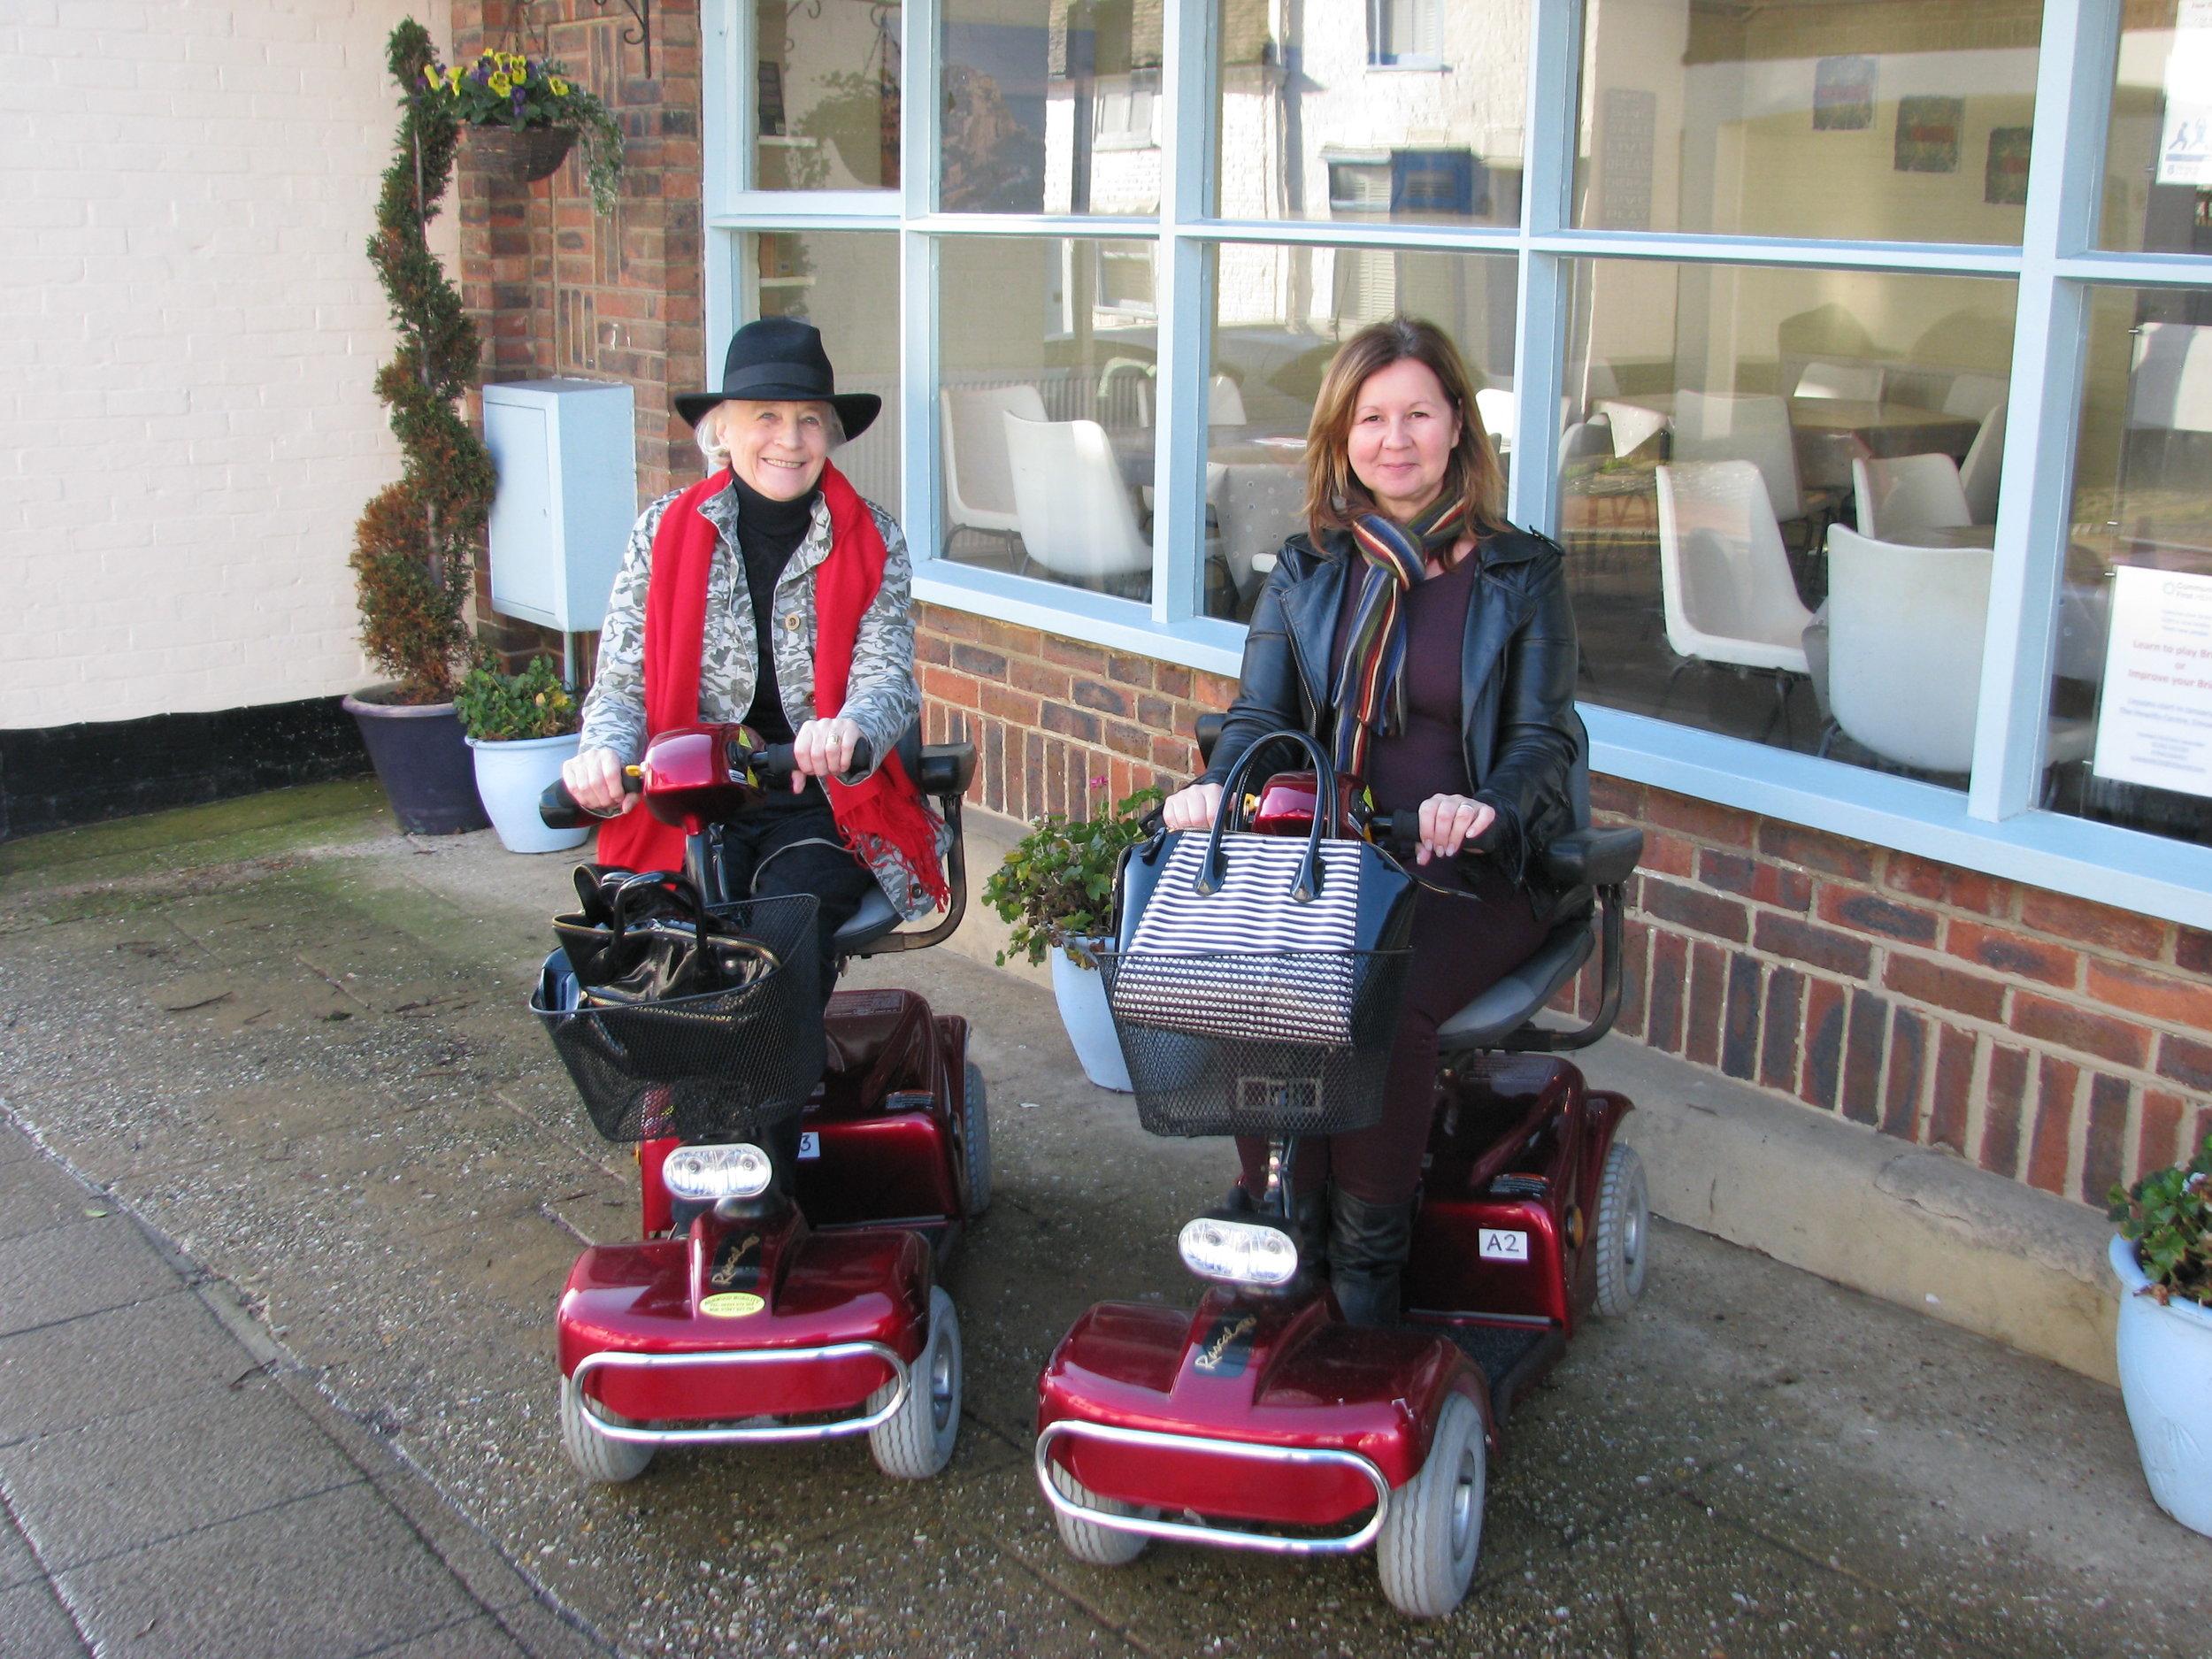 shopmobility photo.jpg